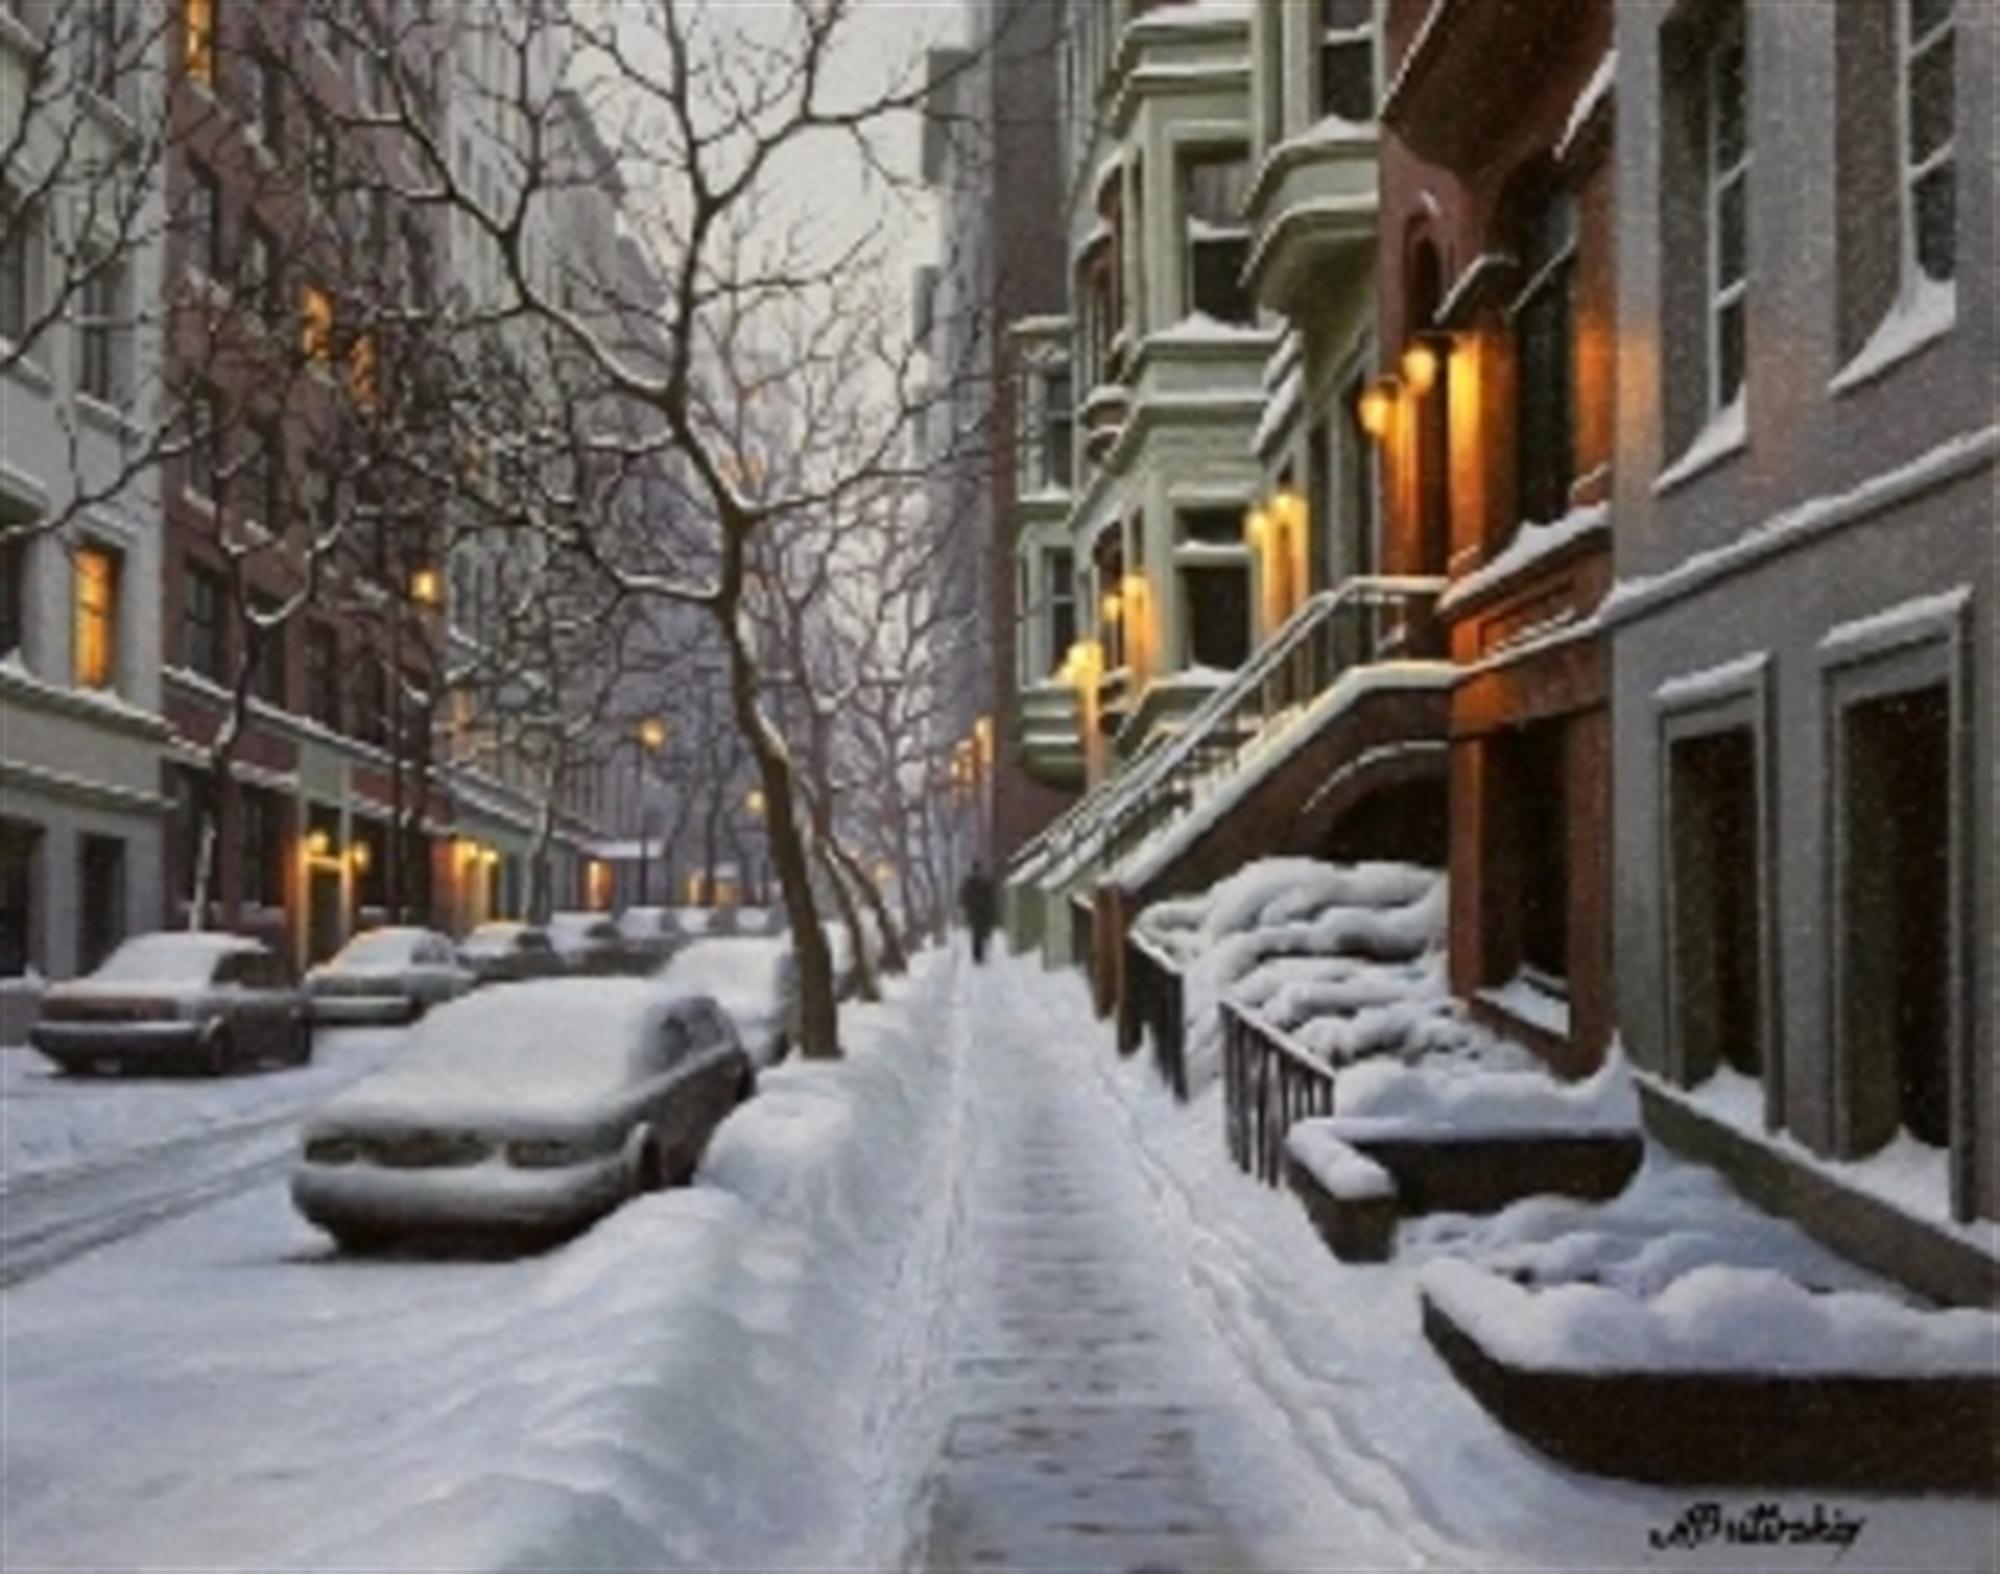 New York Brownstones by Alexei Butirskiy